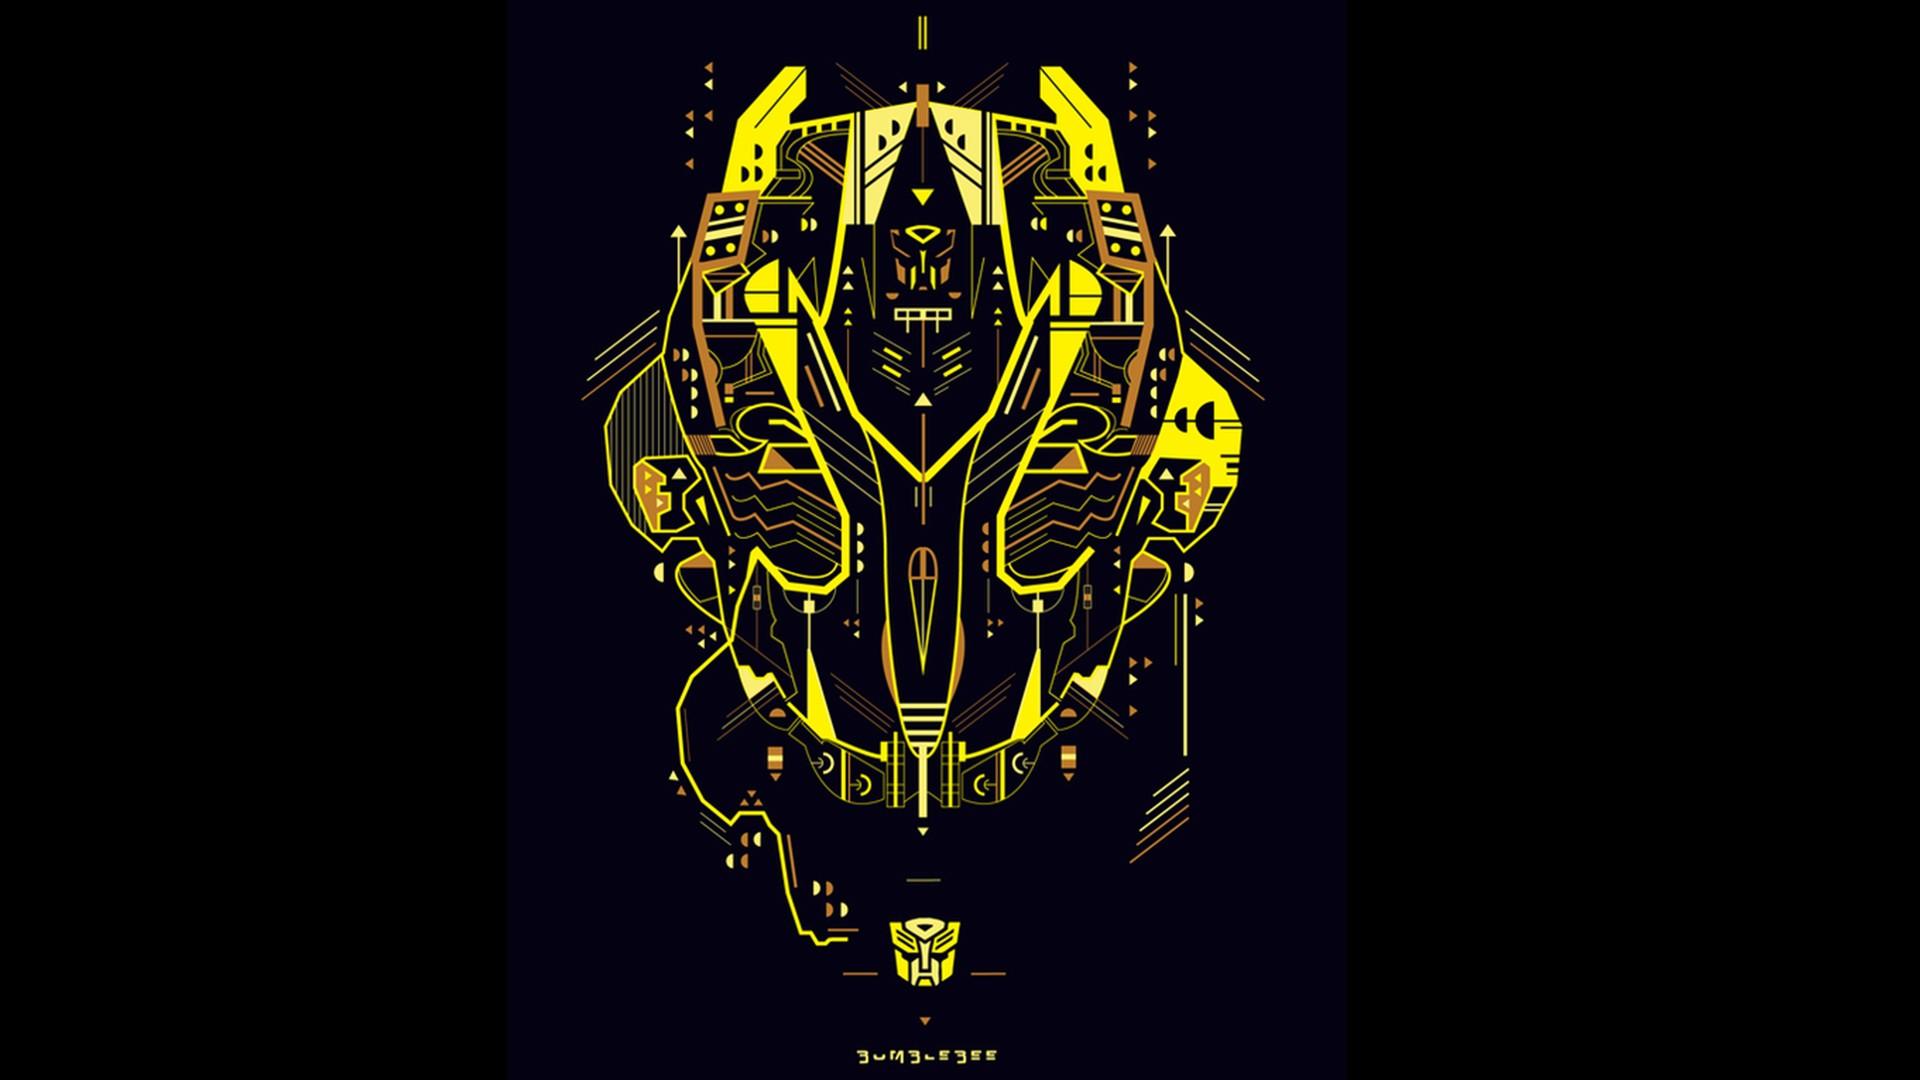 Optimus Prime Transformers Wallpapers | HD Wallpapers